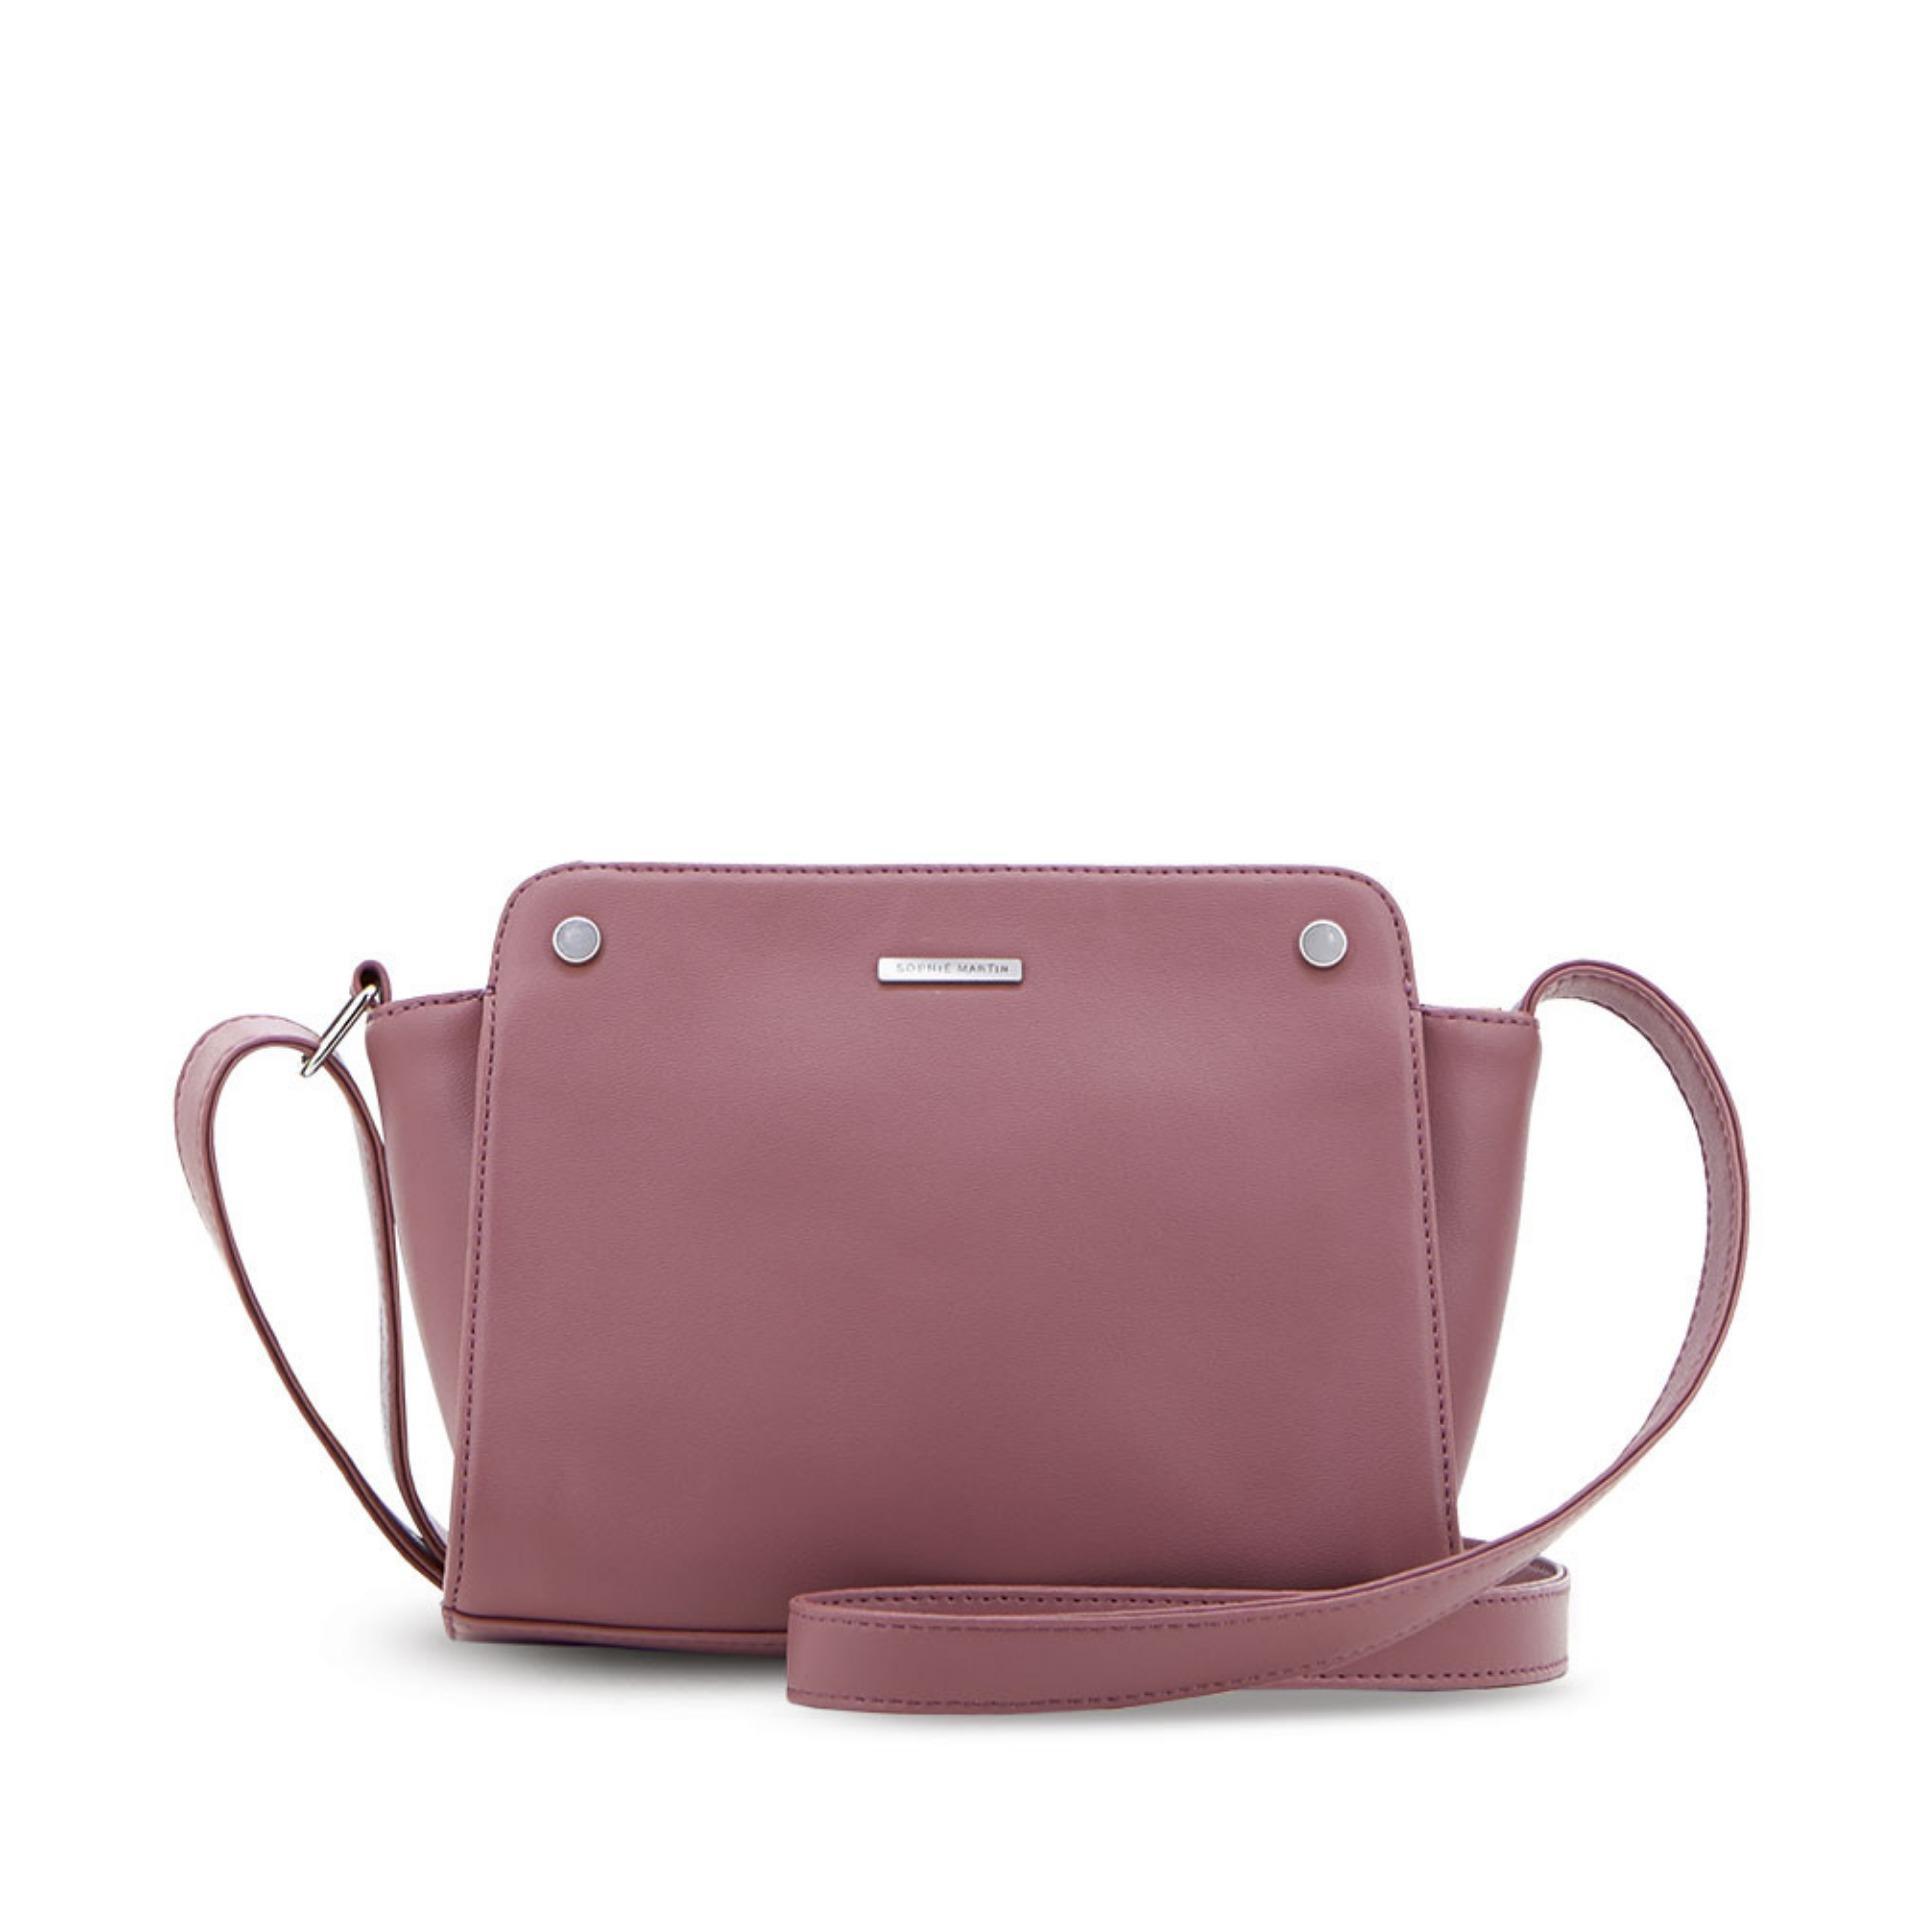 Fitur Sophie Paris Tas Selempang Wanita Import Branded Cielo Bag Hana Ahphbu Liana T4482d1 Dusty Pink